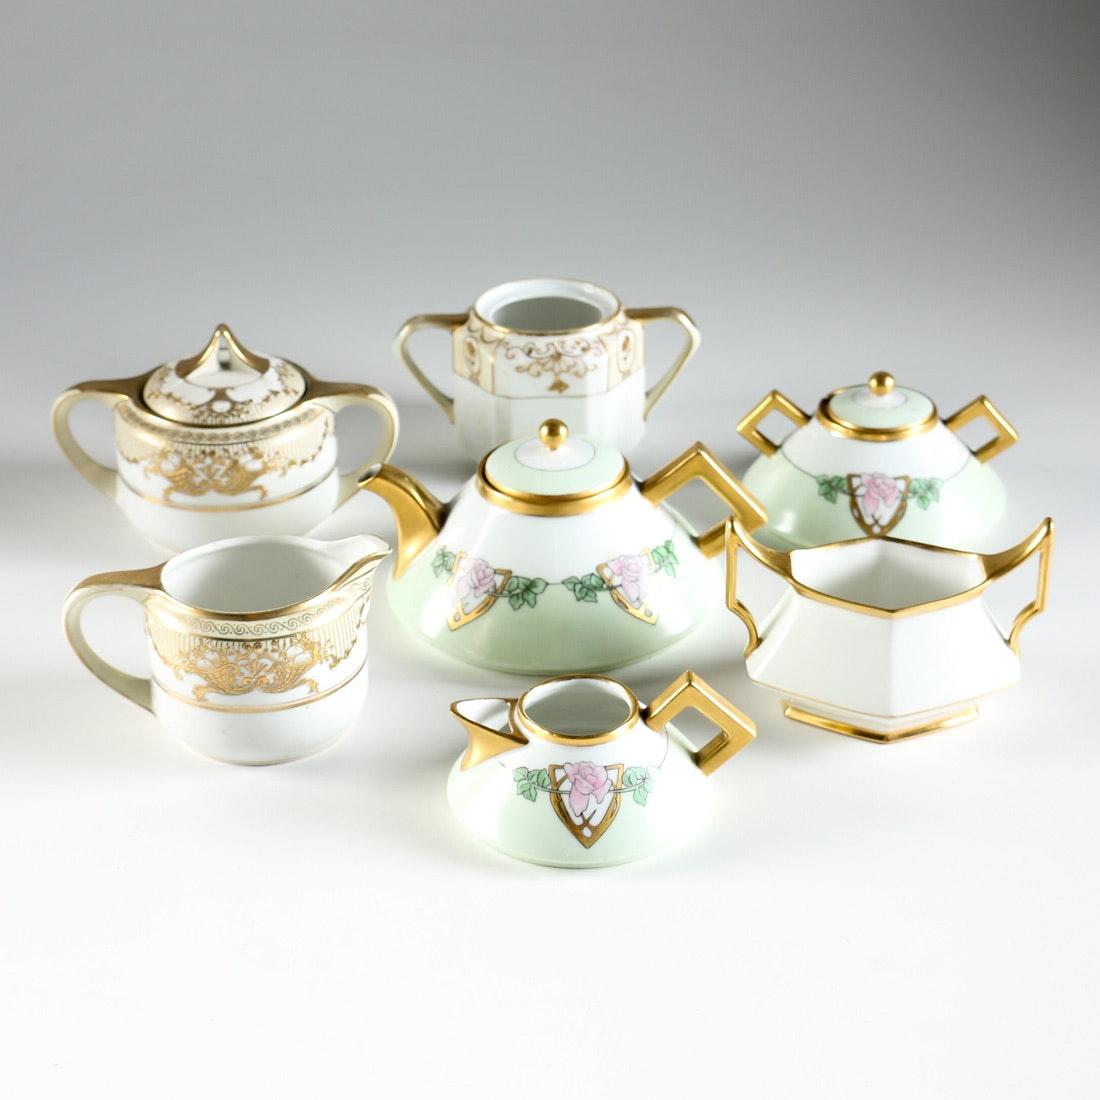 Gold Toned Porcelain Teaware